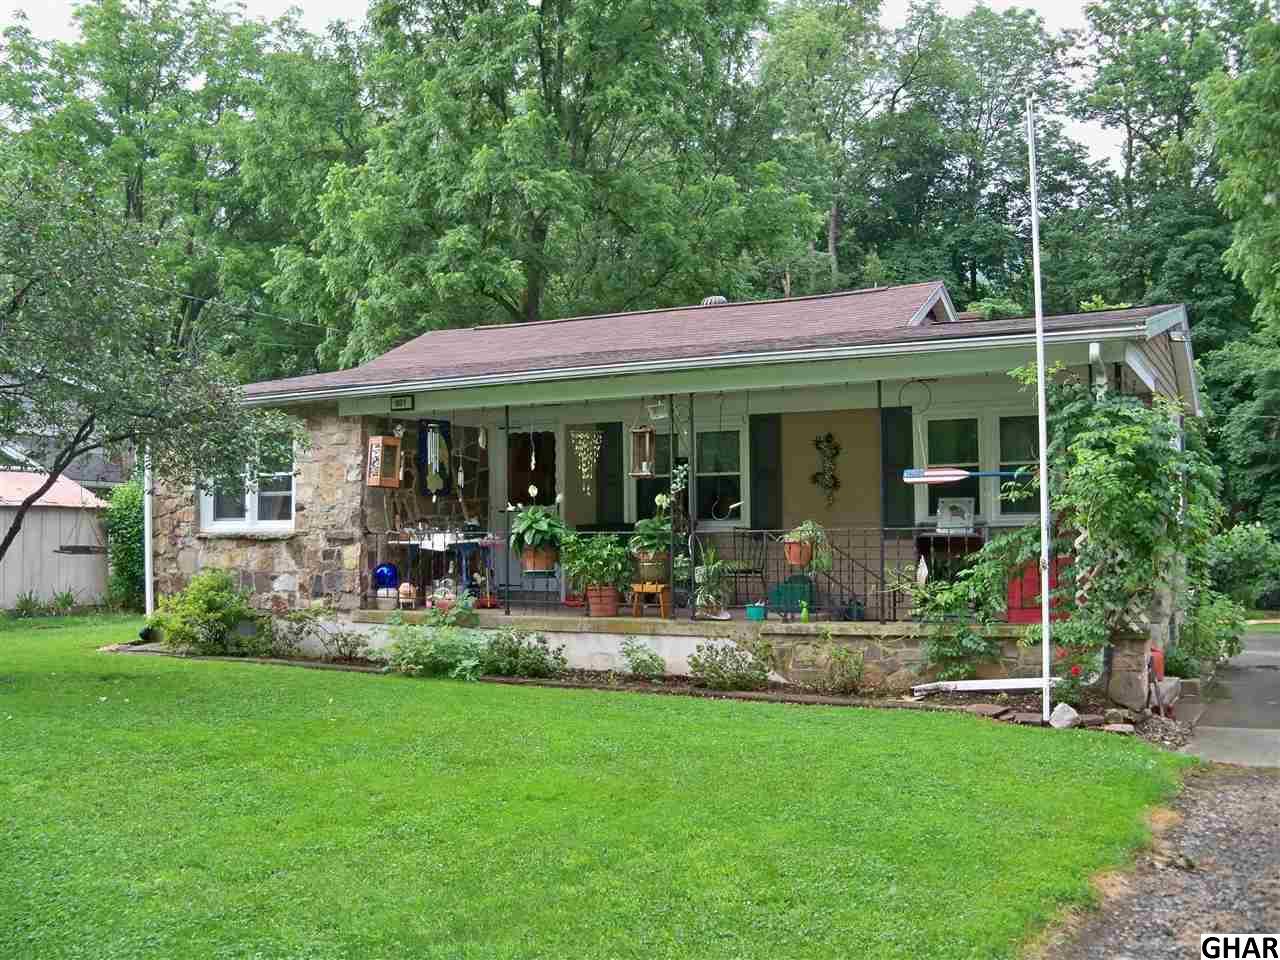 Real Estate for Sale, ListingId: 34157377, Dauphin,PA17018